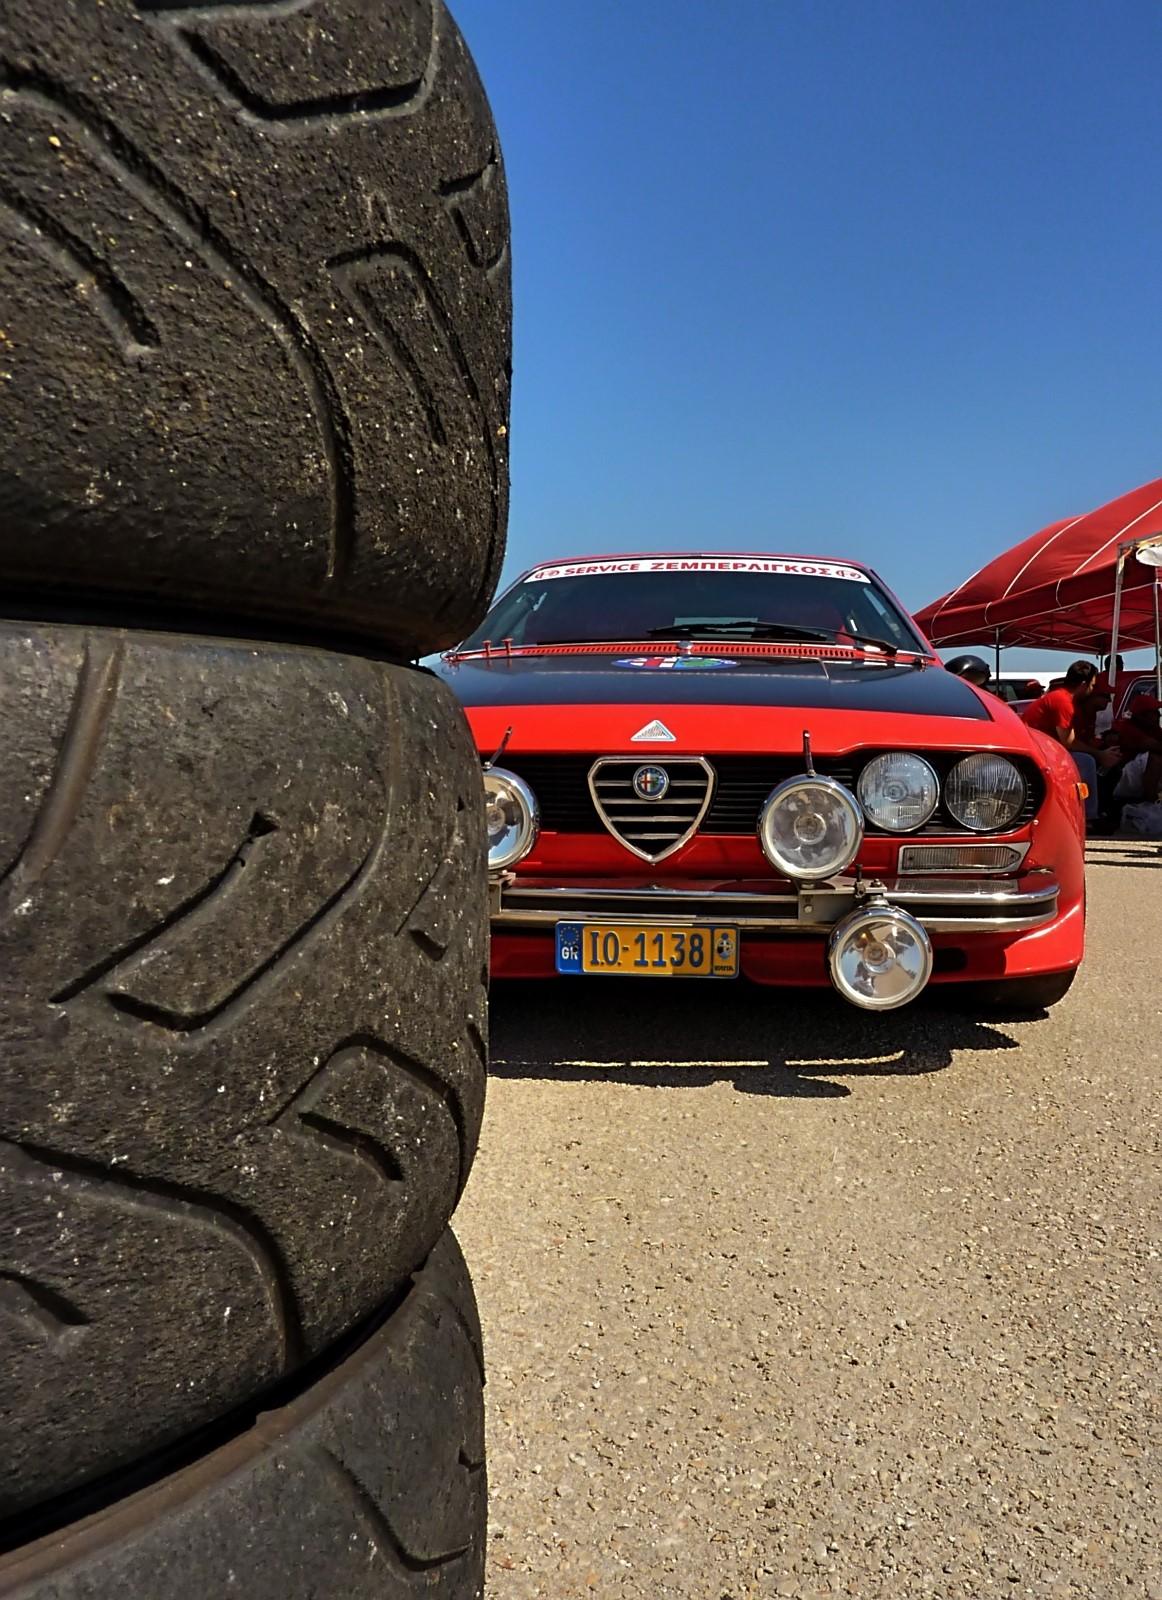 1974 Alfa Romeo Alfetta GT 1800 Group 2 (16)